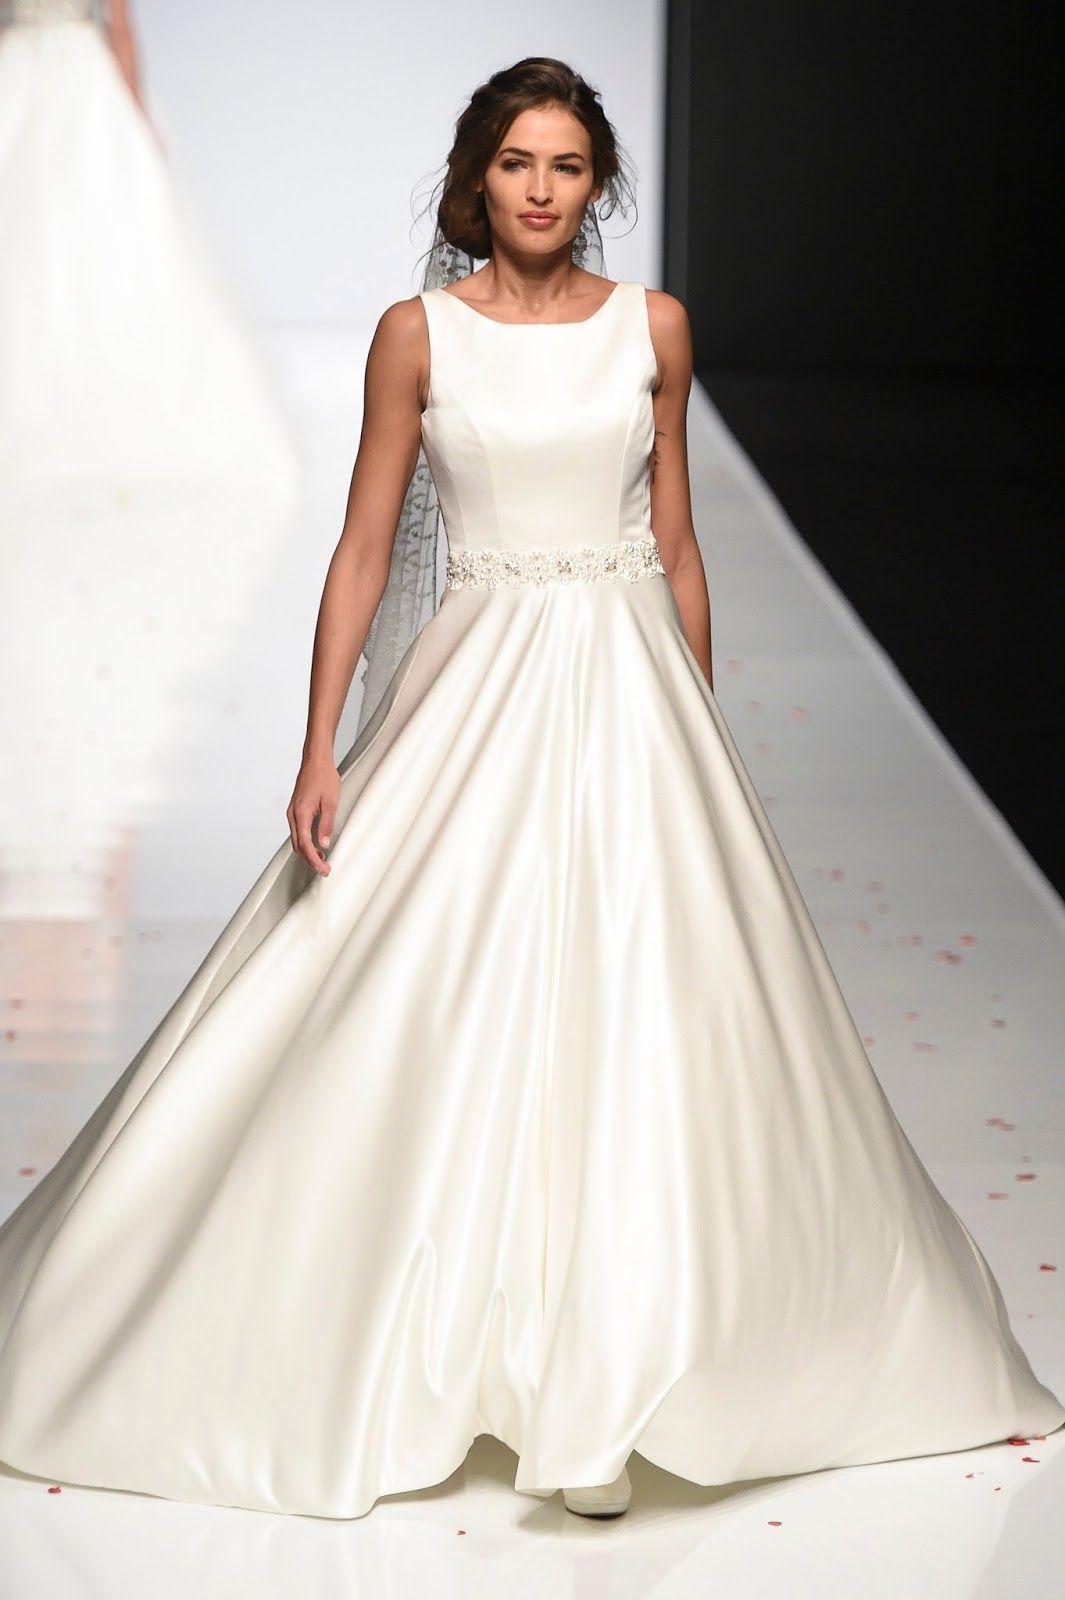 Wedding Gown Elegance March 28, 2018   Gowns, Weddings and Wedding